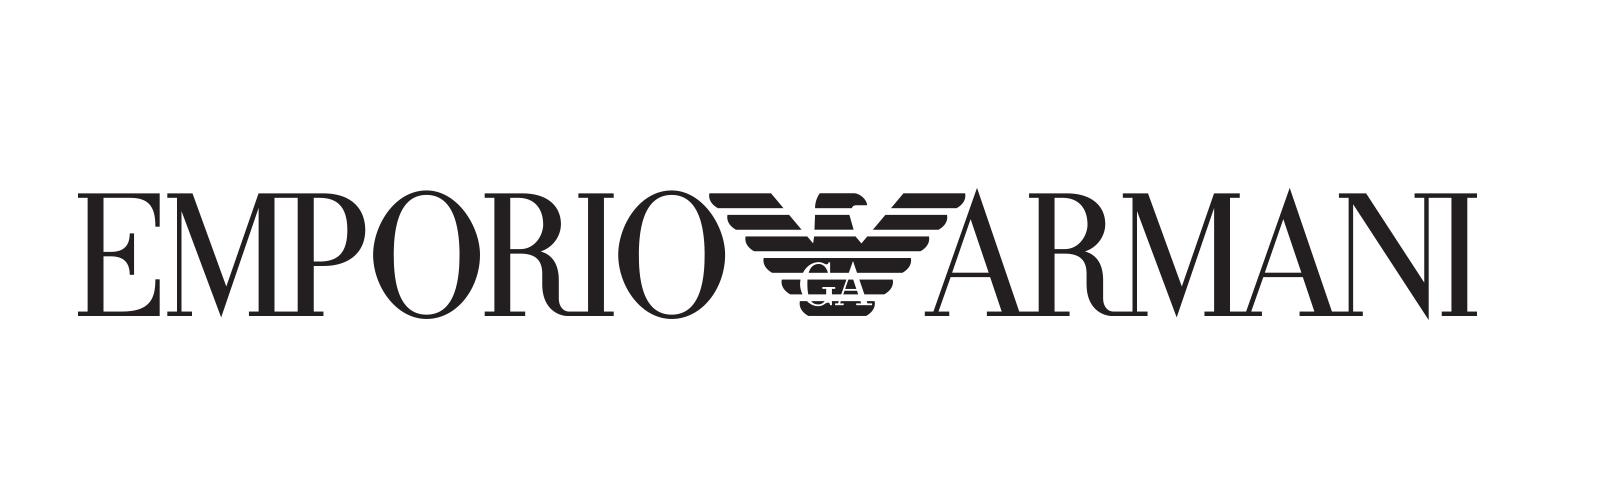 emporio-armani-logo-1